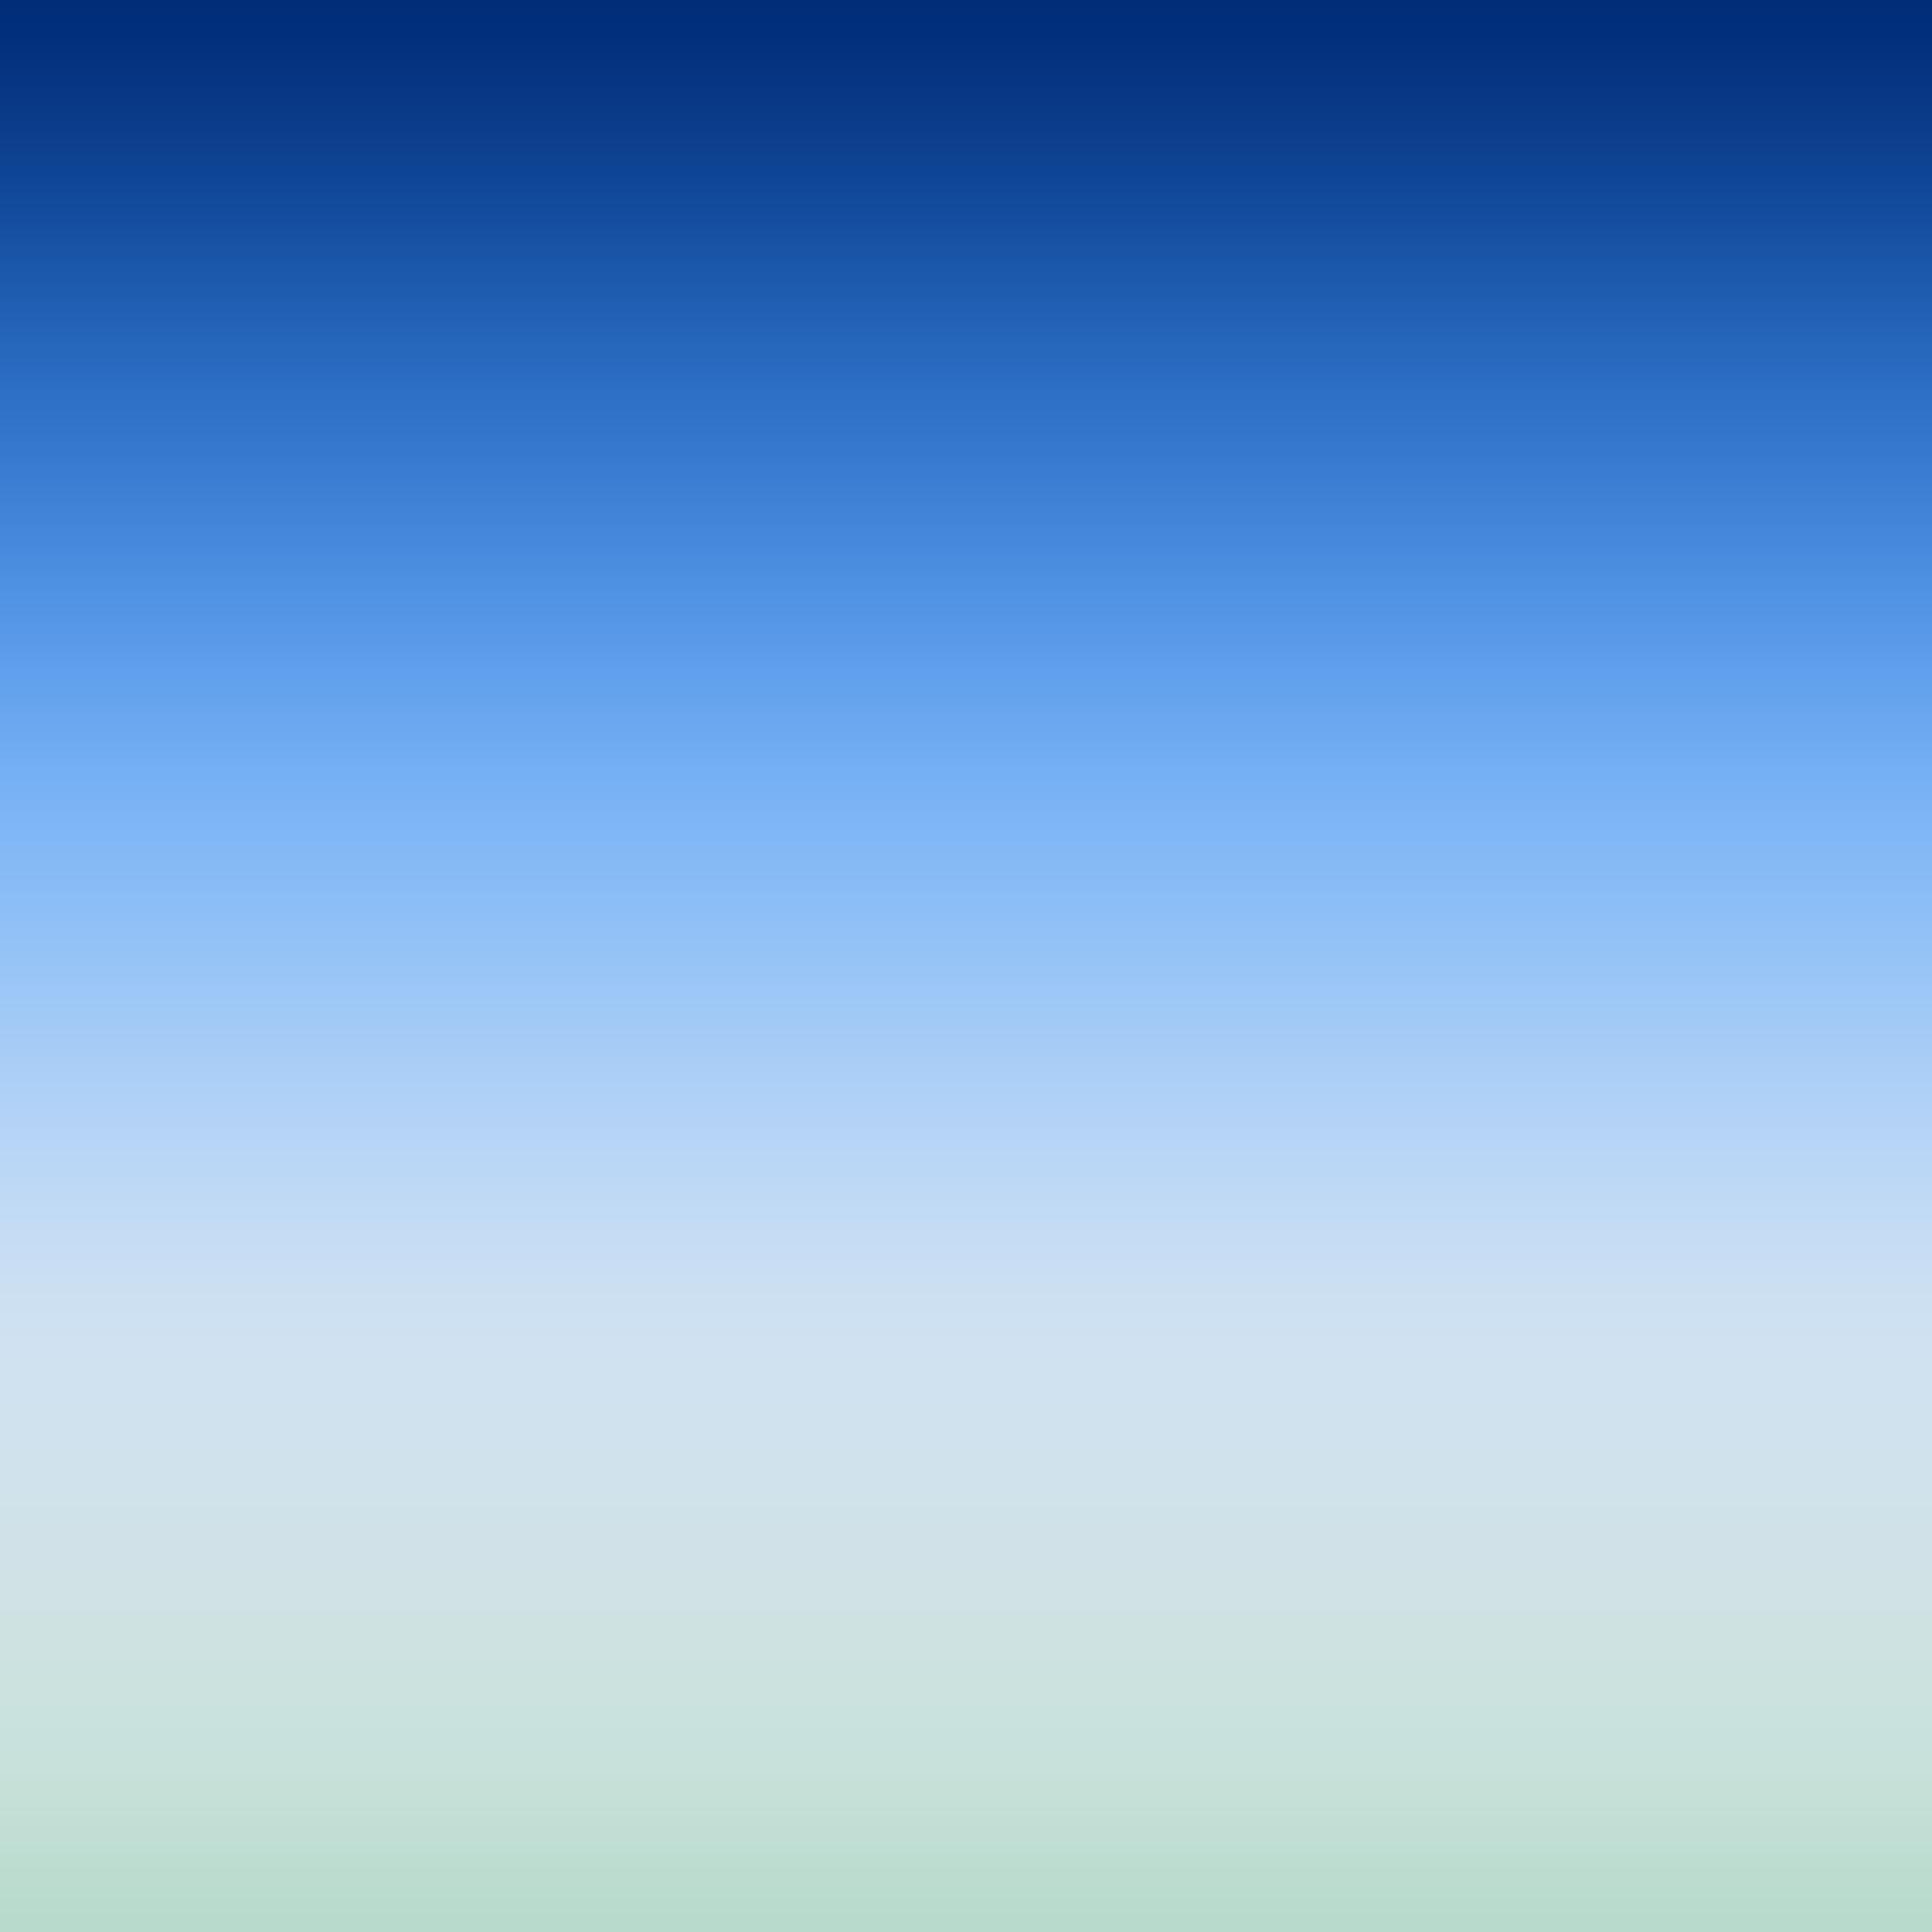 Filename iPad mini retina wallpaper HD color ios7 parallax 4444jpg 2048x2048